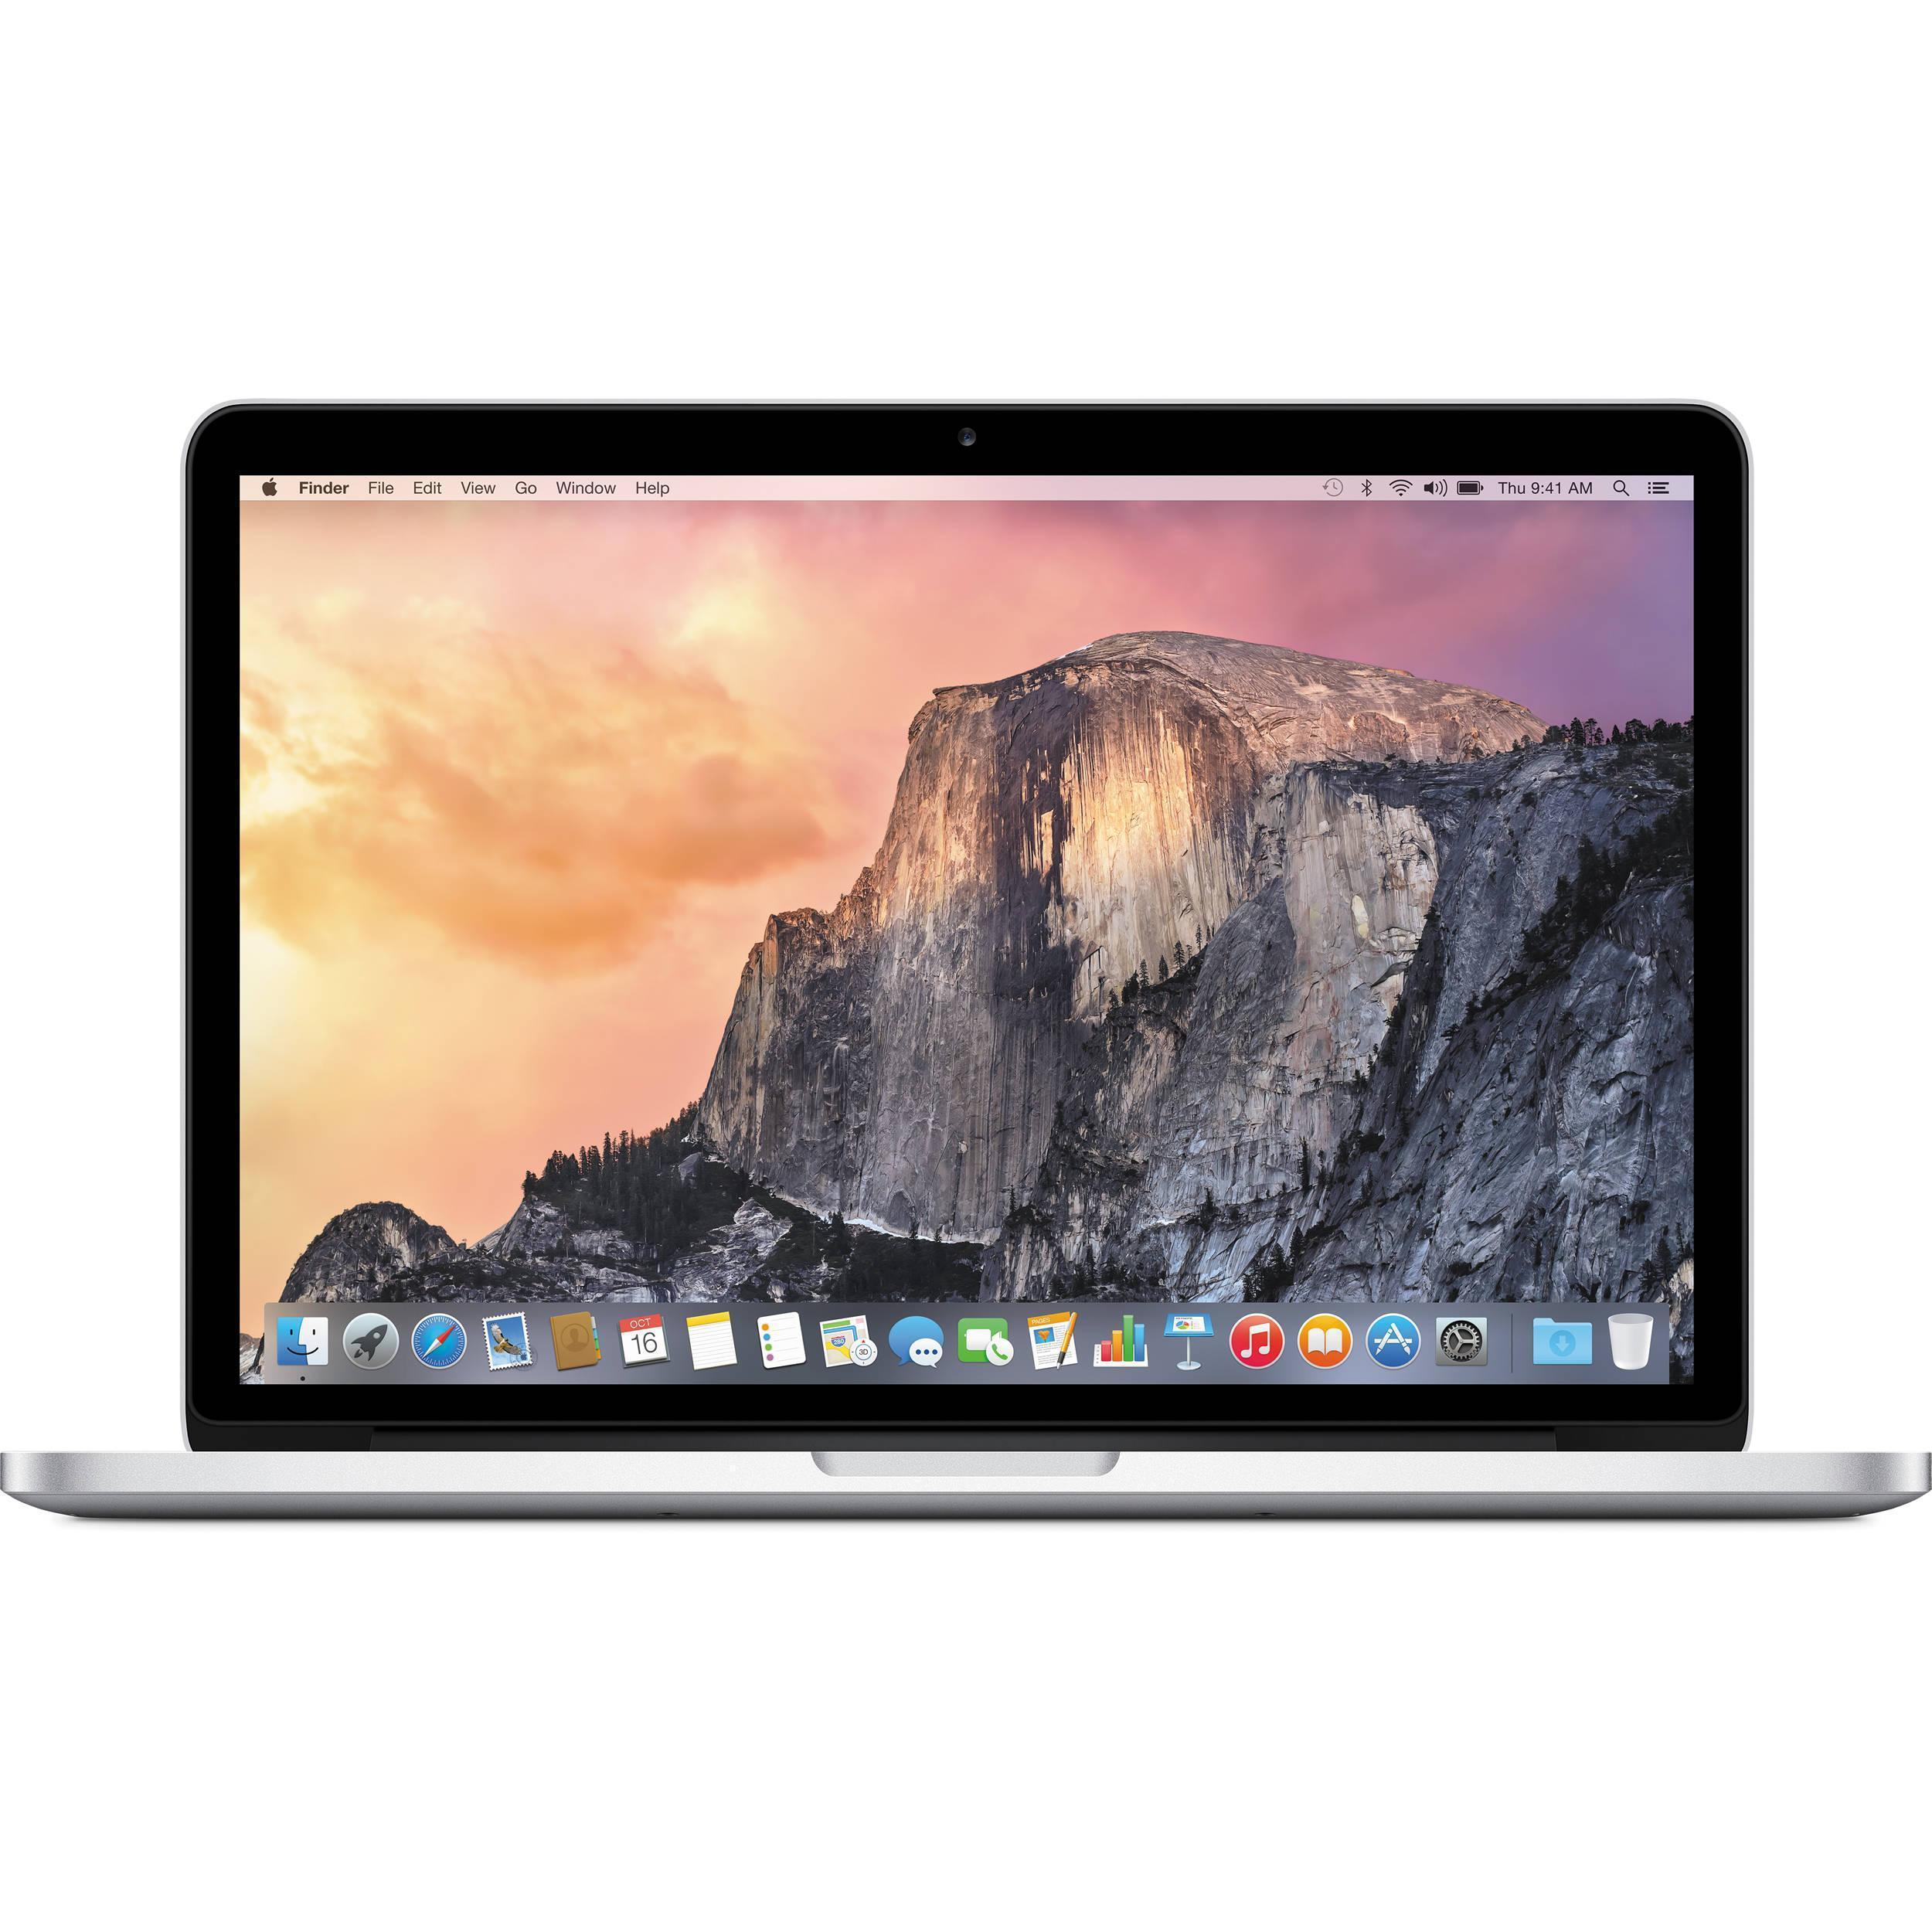 "MacBook Pro 13"" Retina (2015) - Core i5 2,7 GHz - SSD 128 GB - 8GB - QWERTZ - Deutsch"